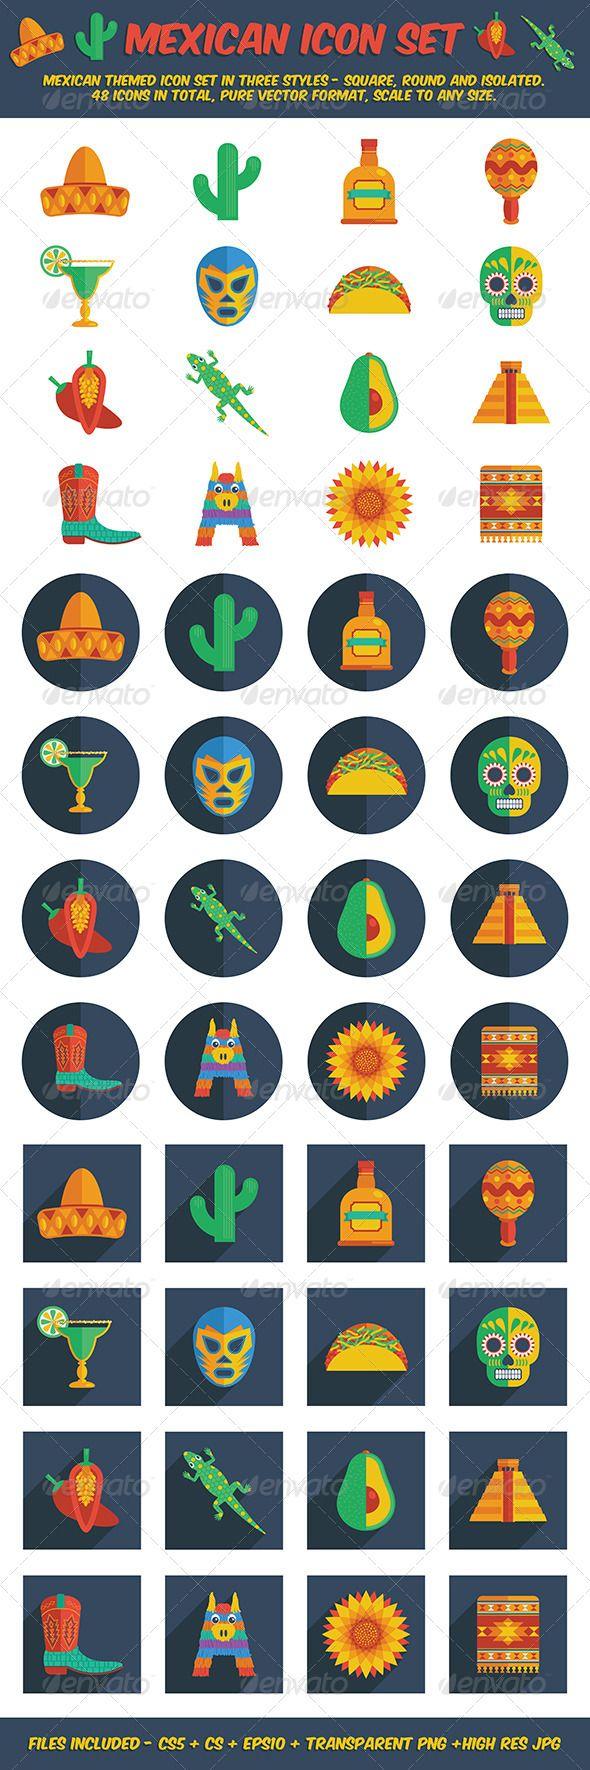 Mexican Icon Set